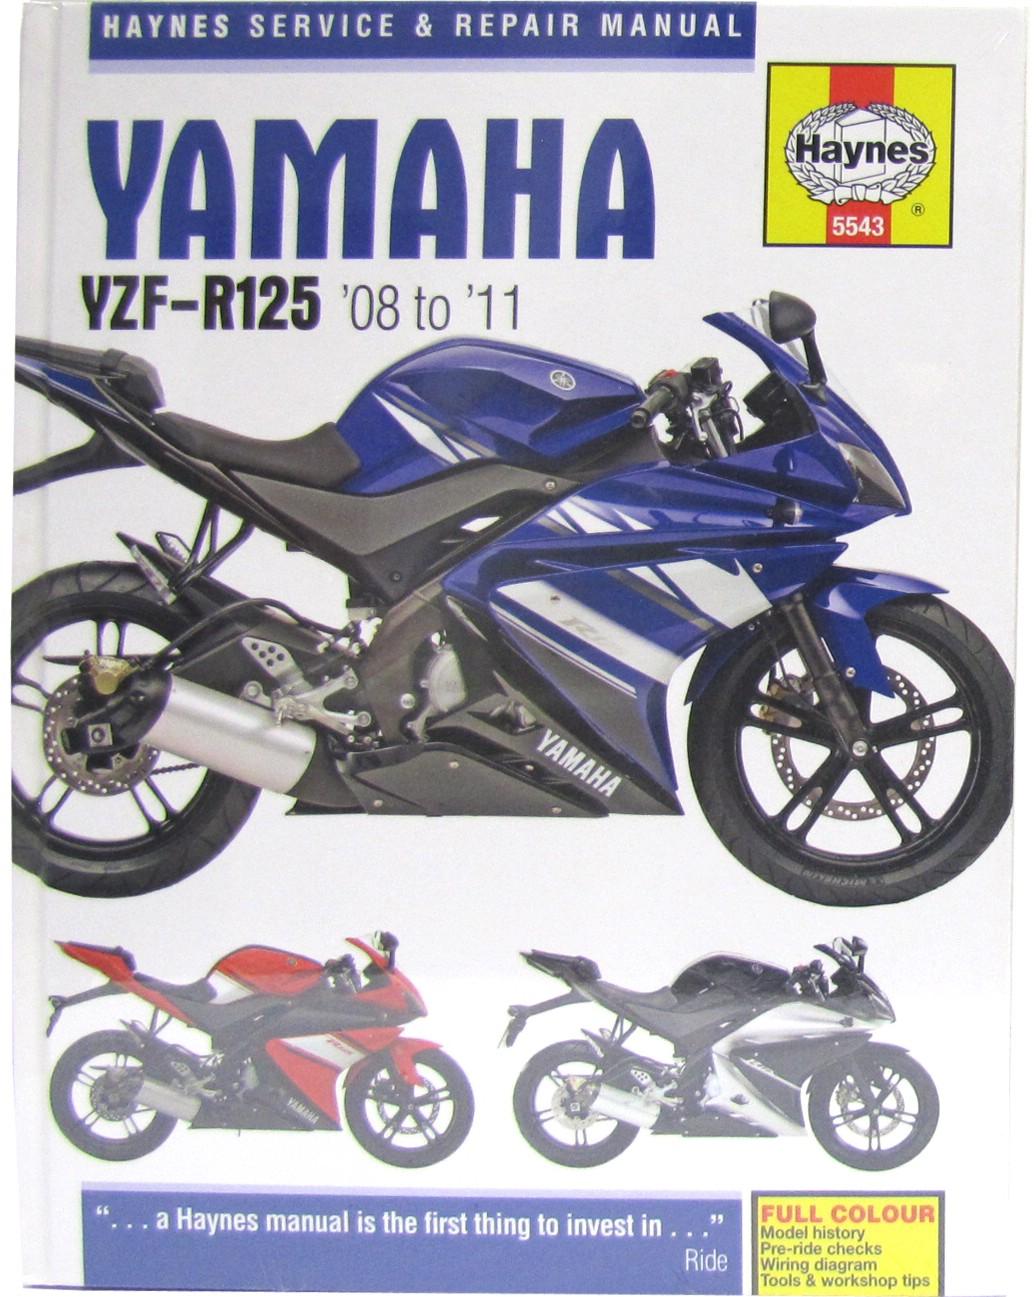 Haynes Manual Yamaha Yzf R125 08 11 Each 692761895768 Ebay Wiring Diagram Image Is Loading